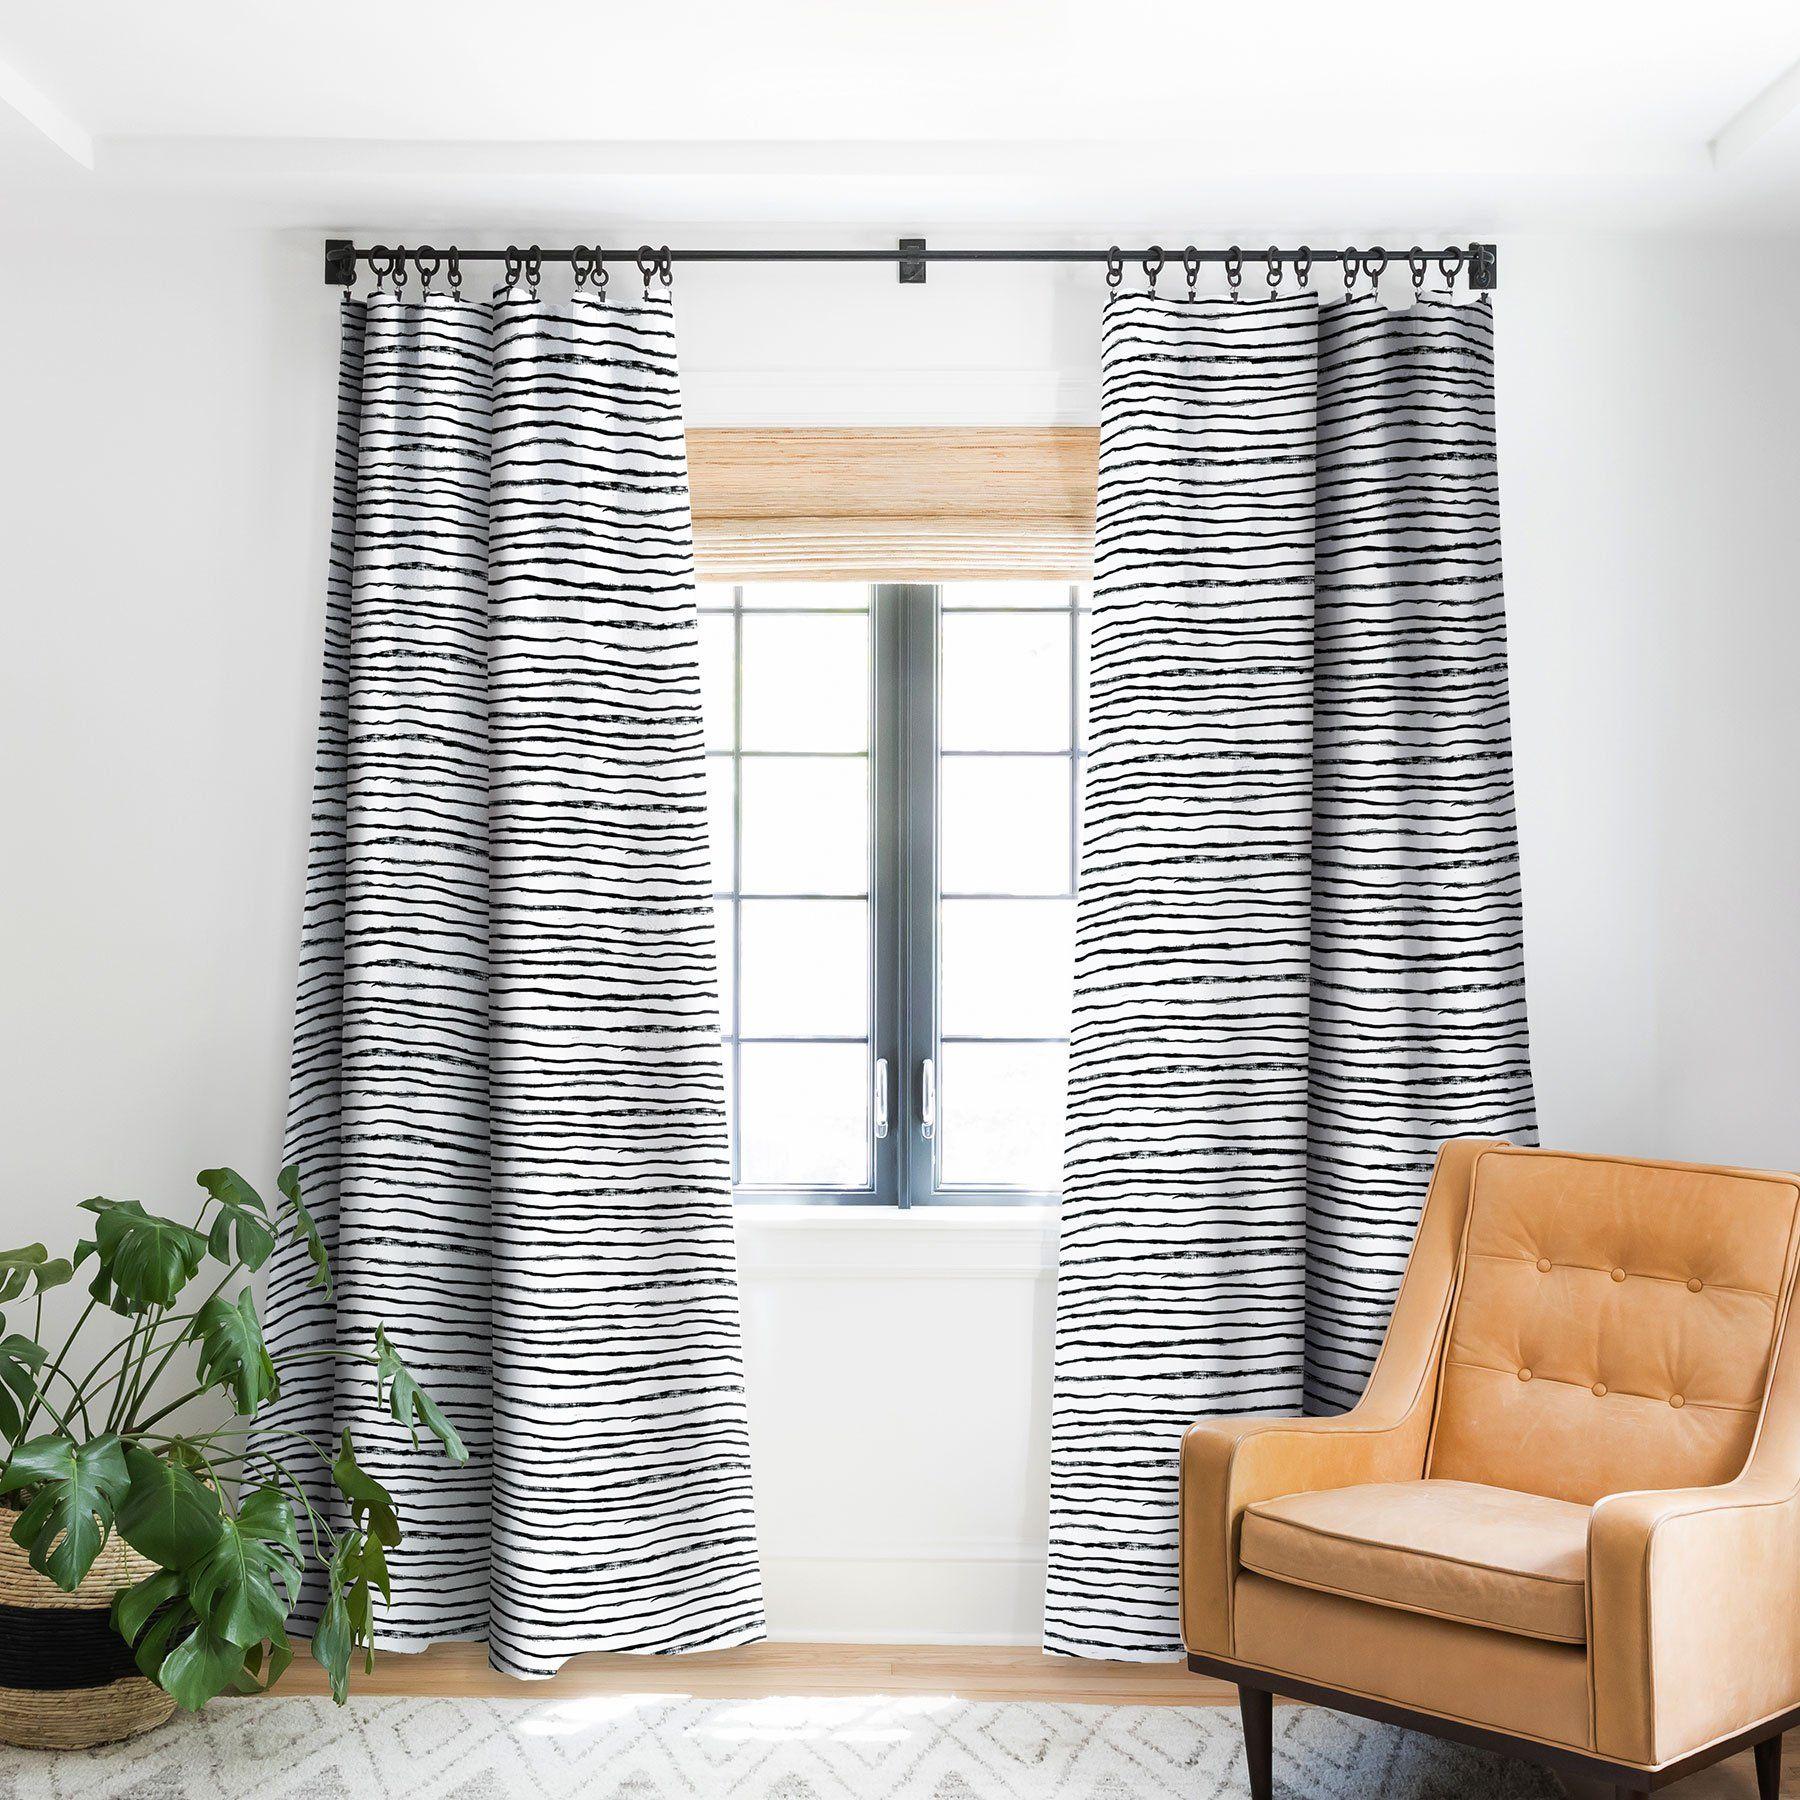 Dash And Ash Painted Stripes Blackout Window Curtain Paint Stripes Striped Curtains Design